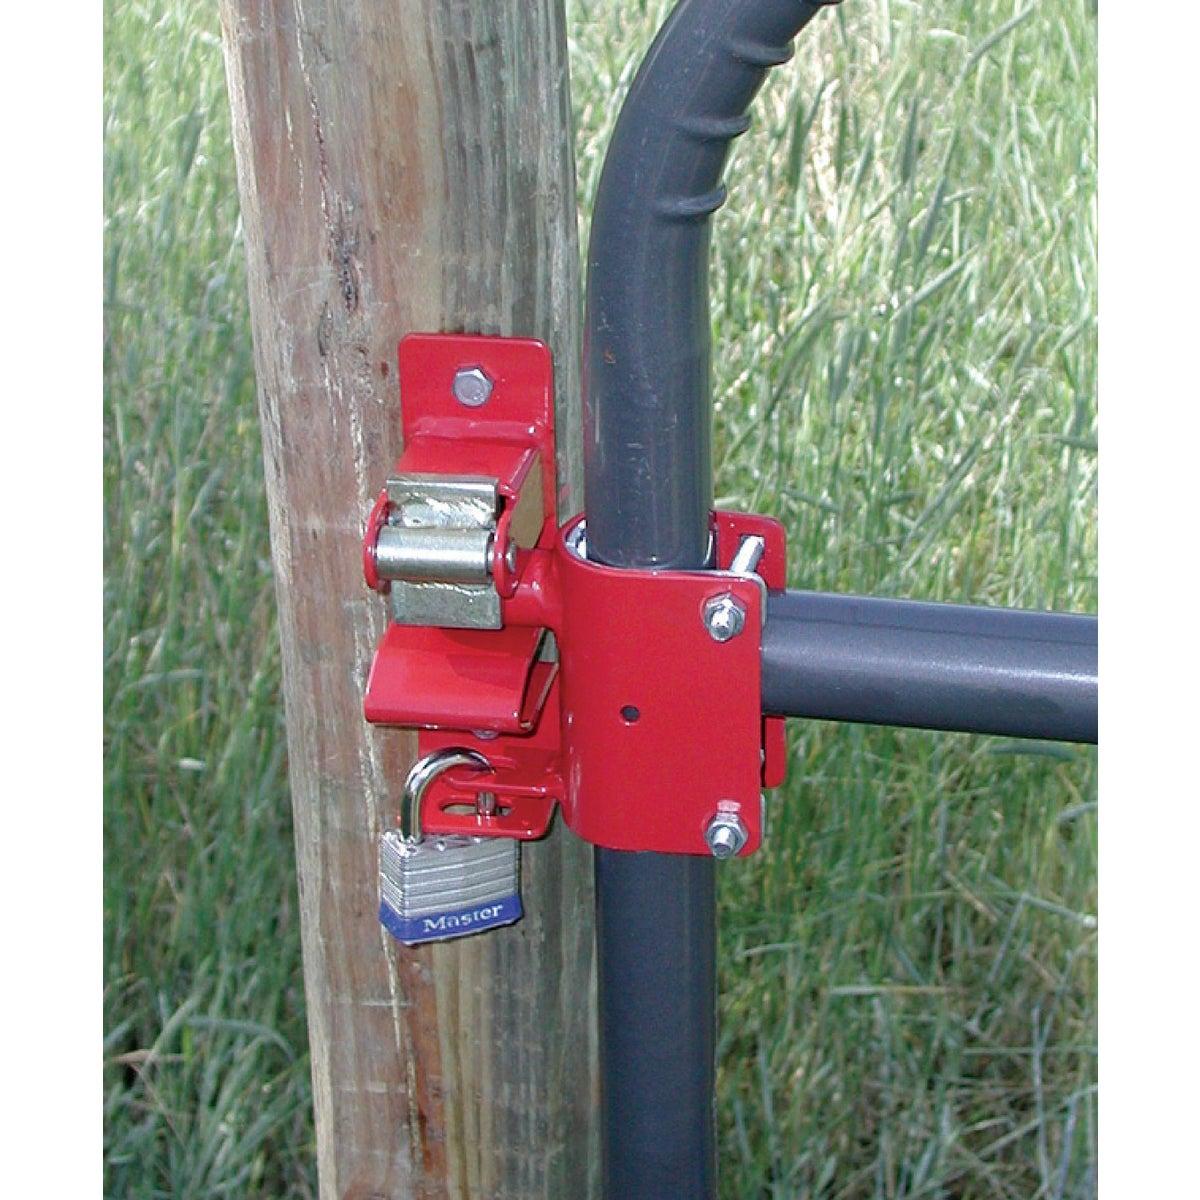 LOCKABLE GATE LATCH - S16100500-GL161005 by Speeco Farmex